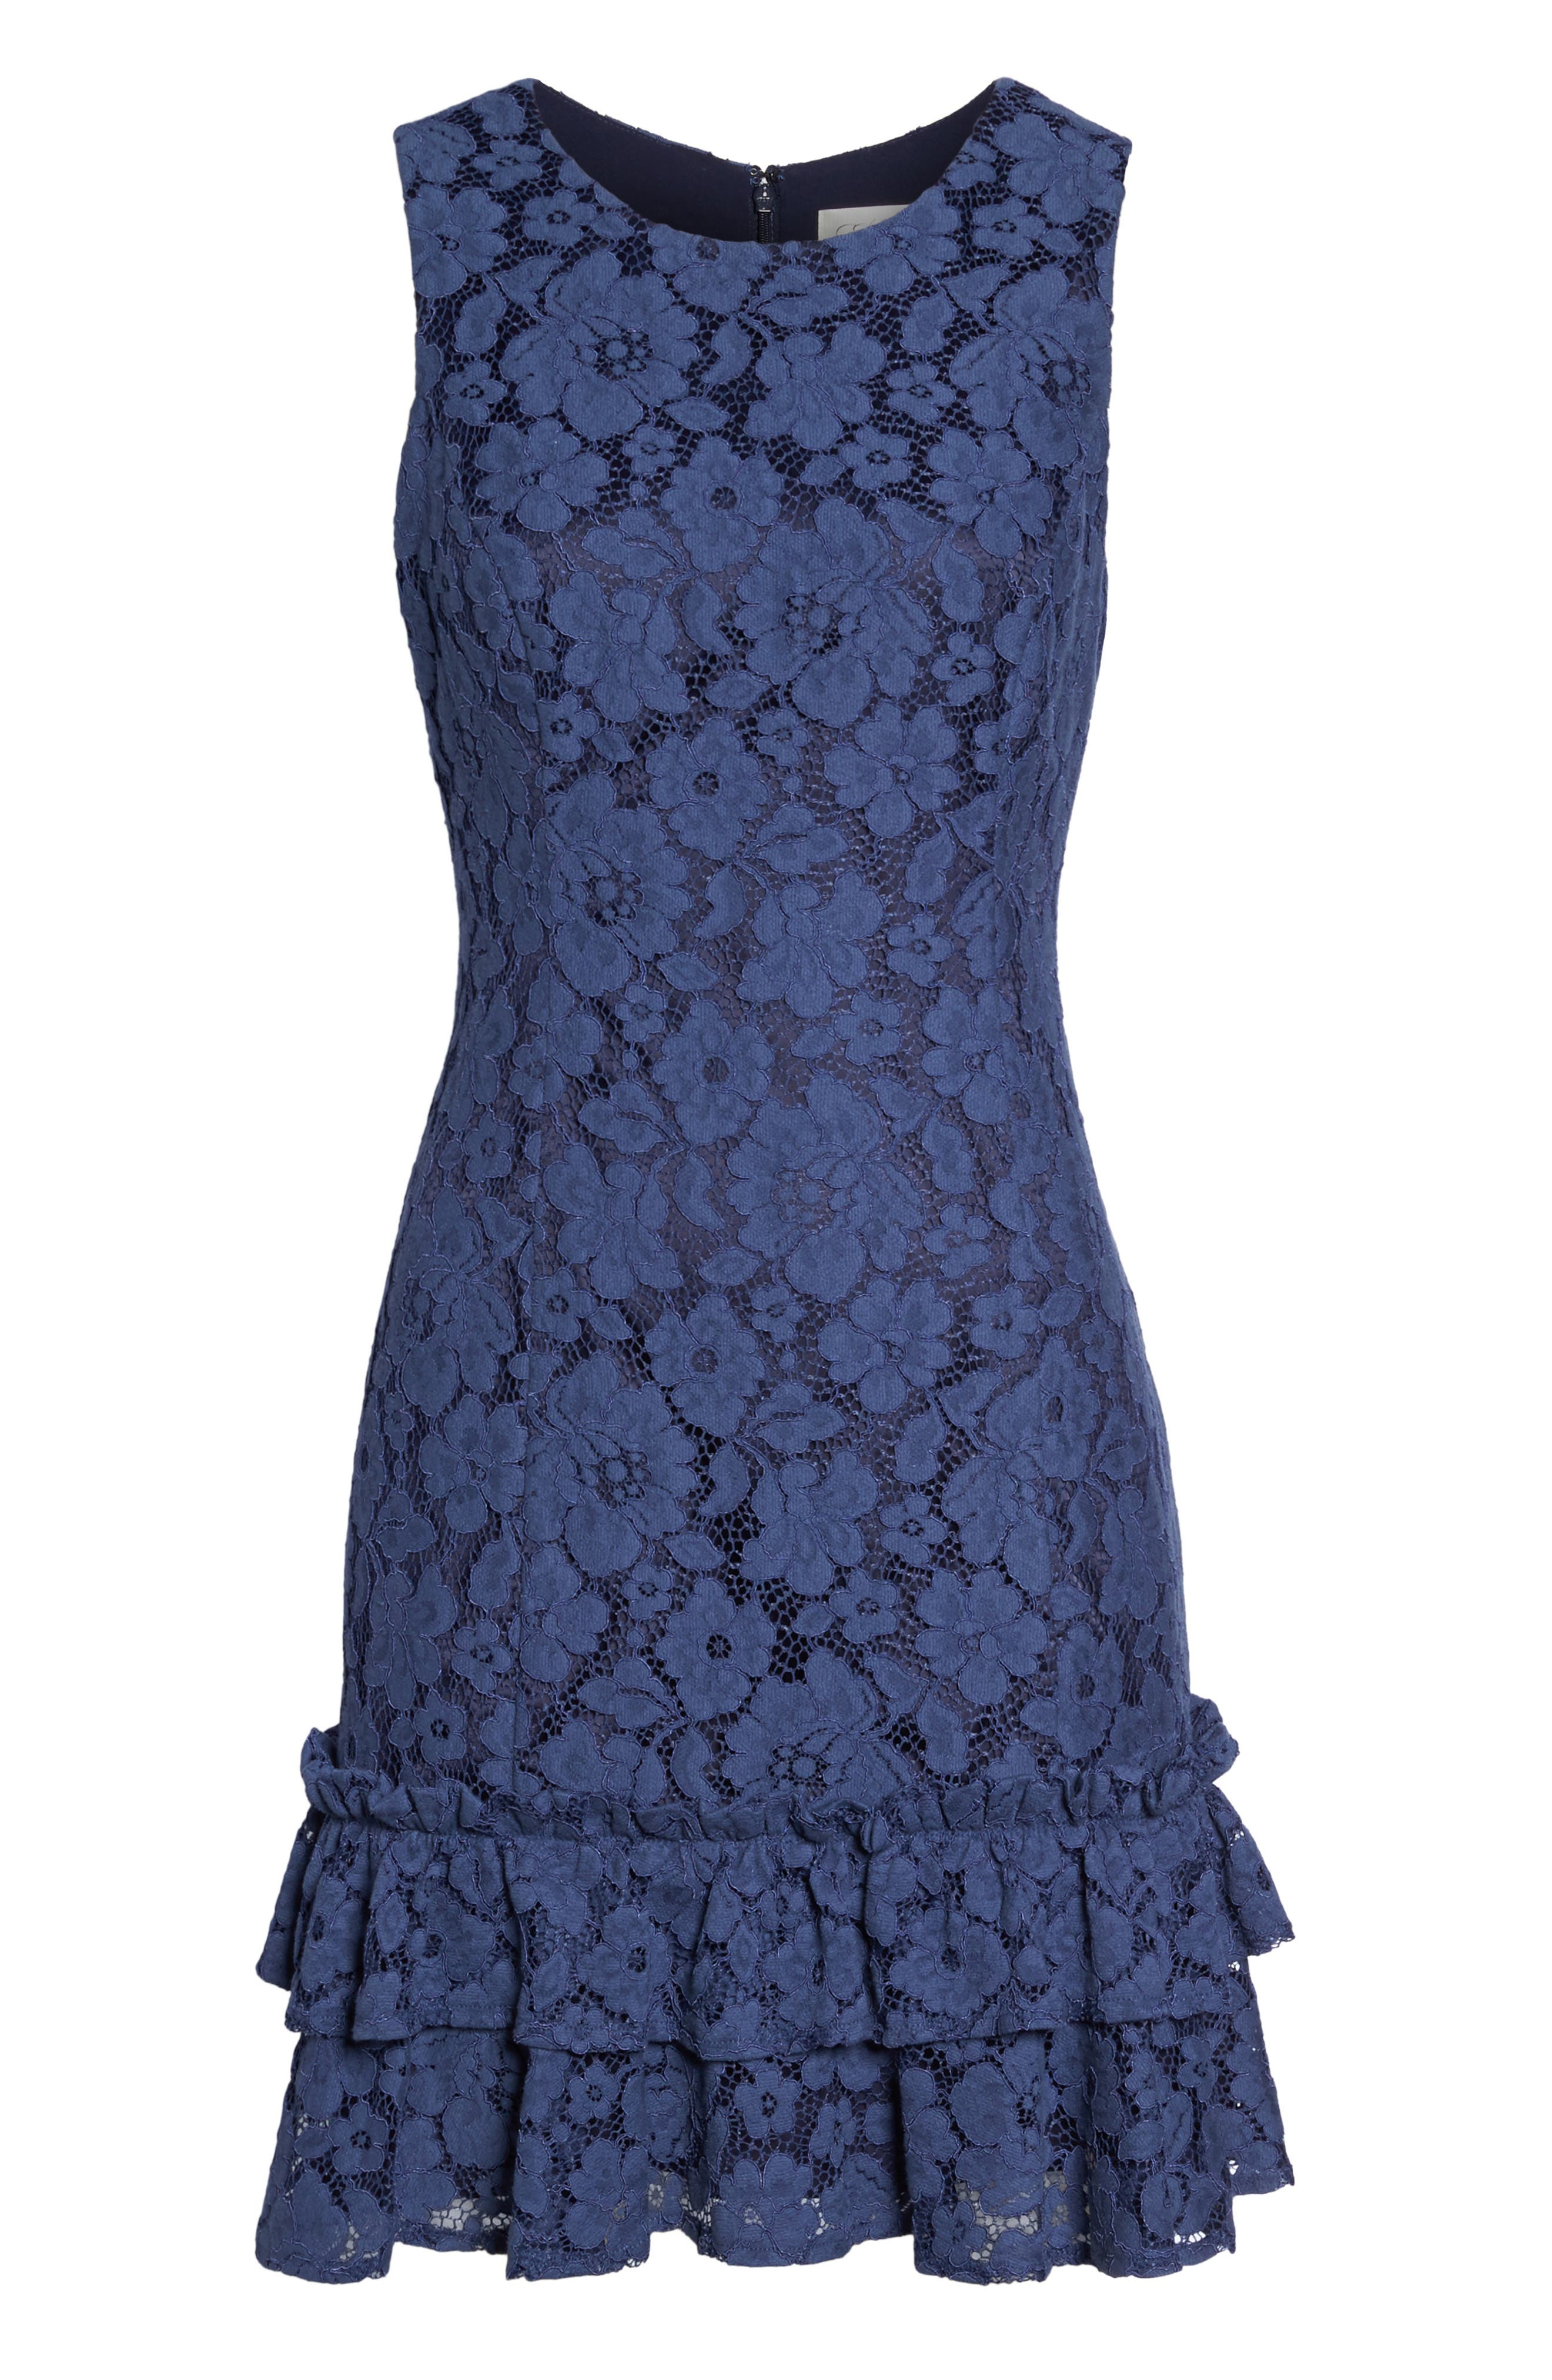 Ruffle Lace Sheath Dress,                             Alternate thumbnail 6, color,                             410